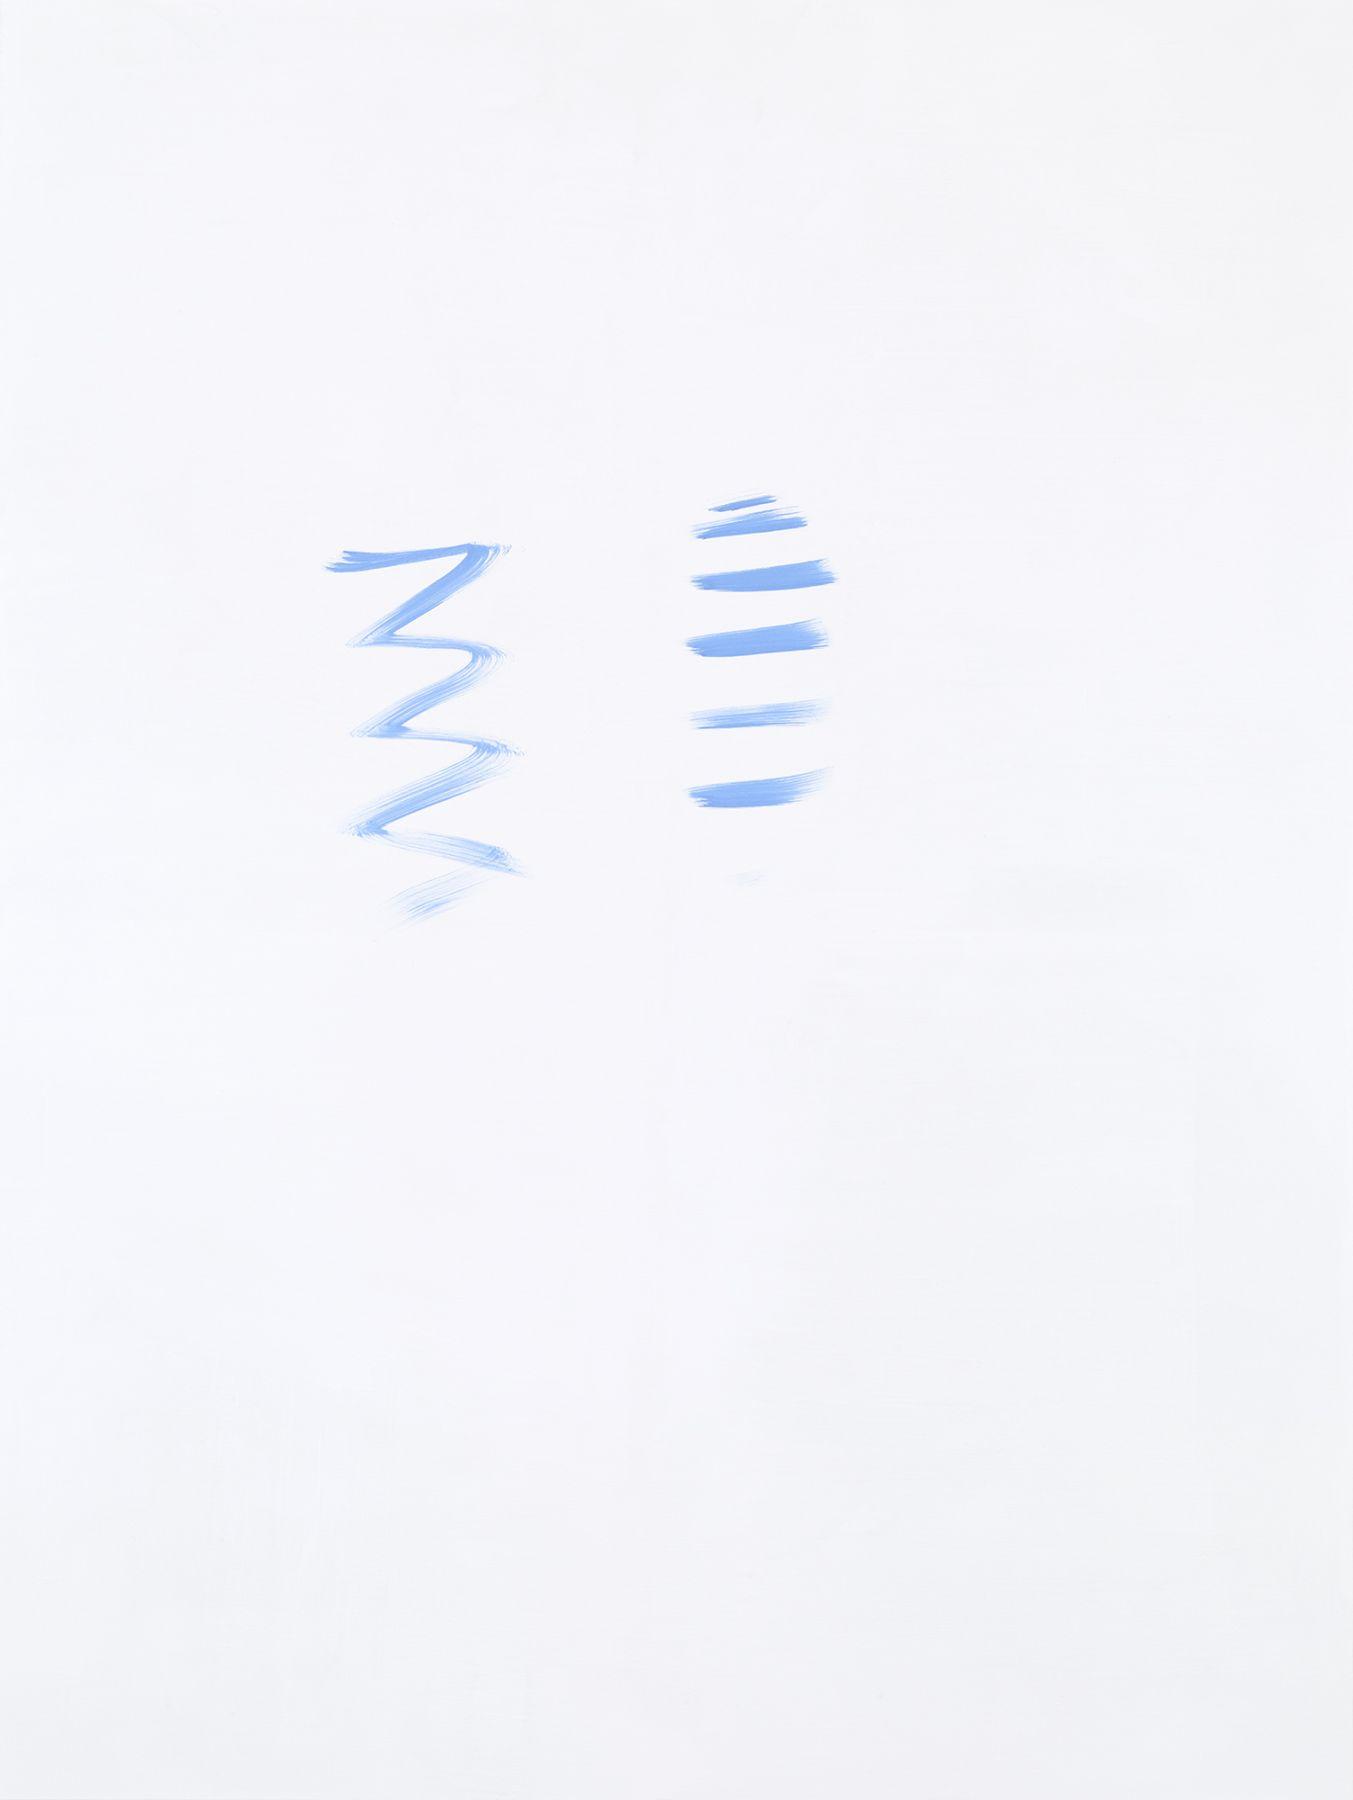 Michael Krebber MK.294, 2015 Acrylic on canvas 78 3/4 x 59 1/8 inches (200 x 150.2 cm)